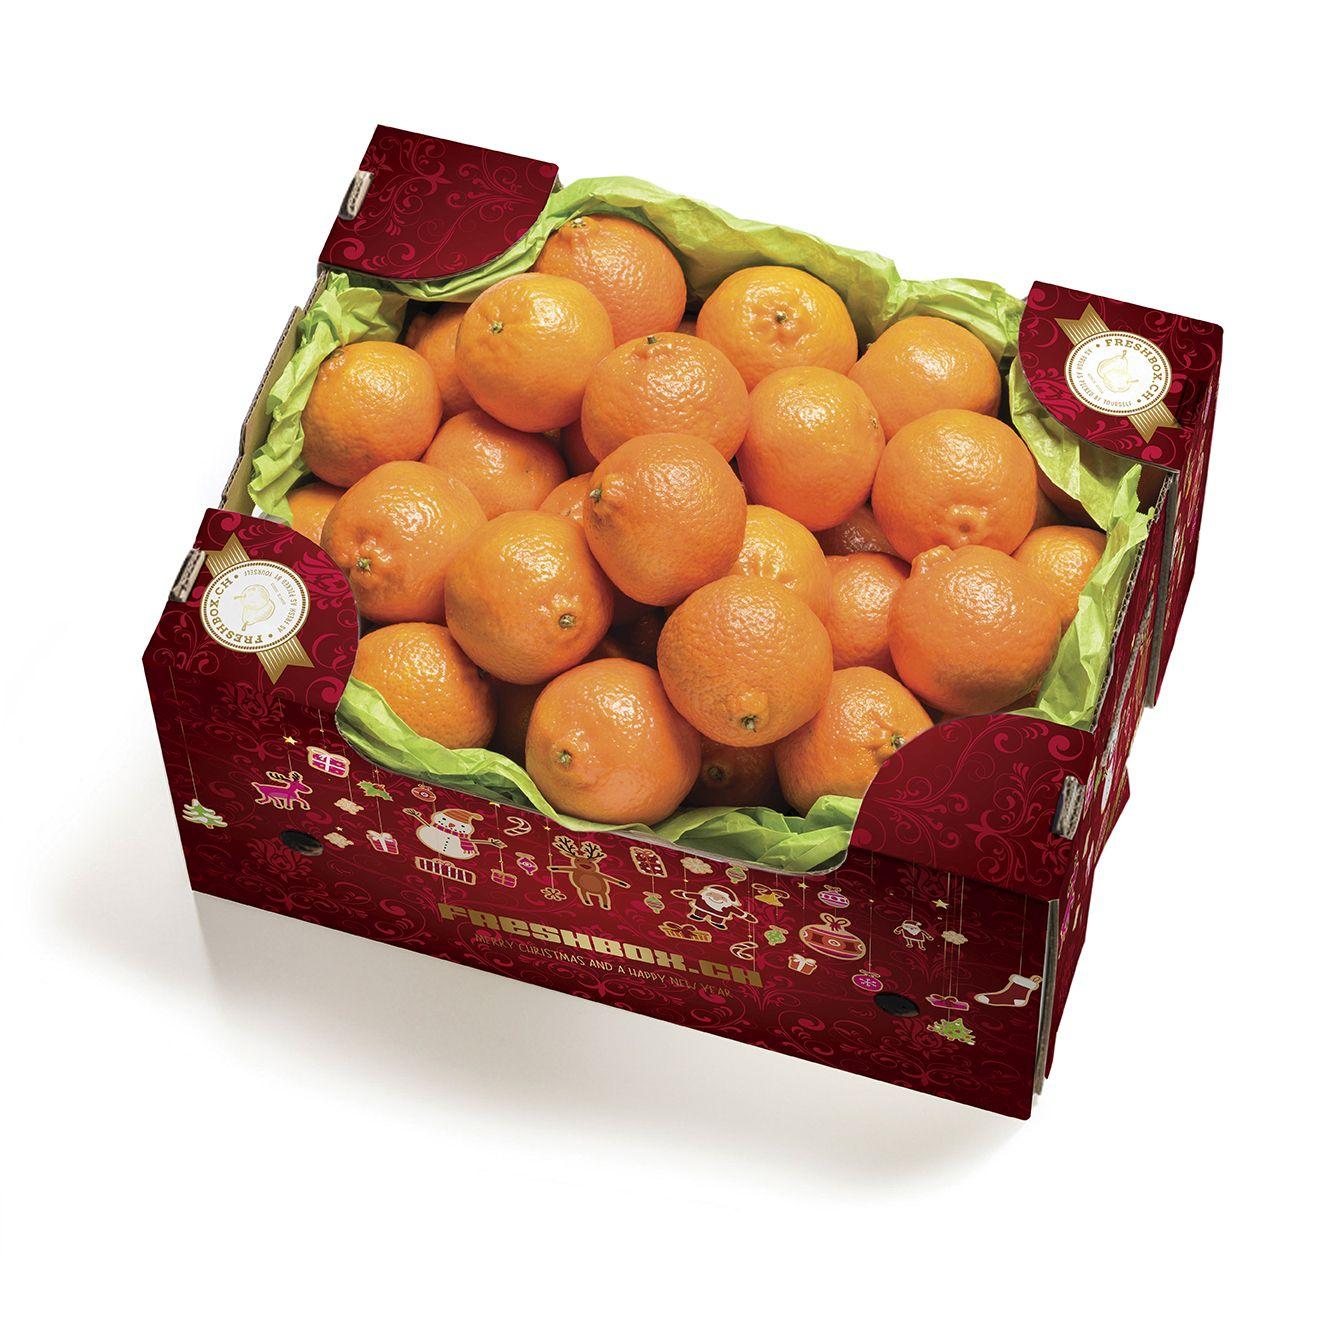 Mandarinenbox_Freshbox_Fruechtebox